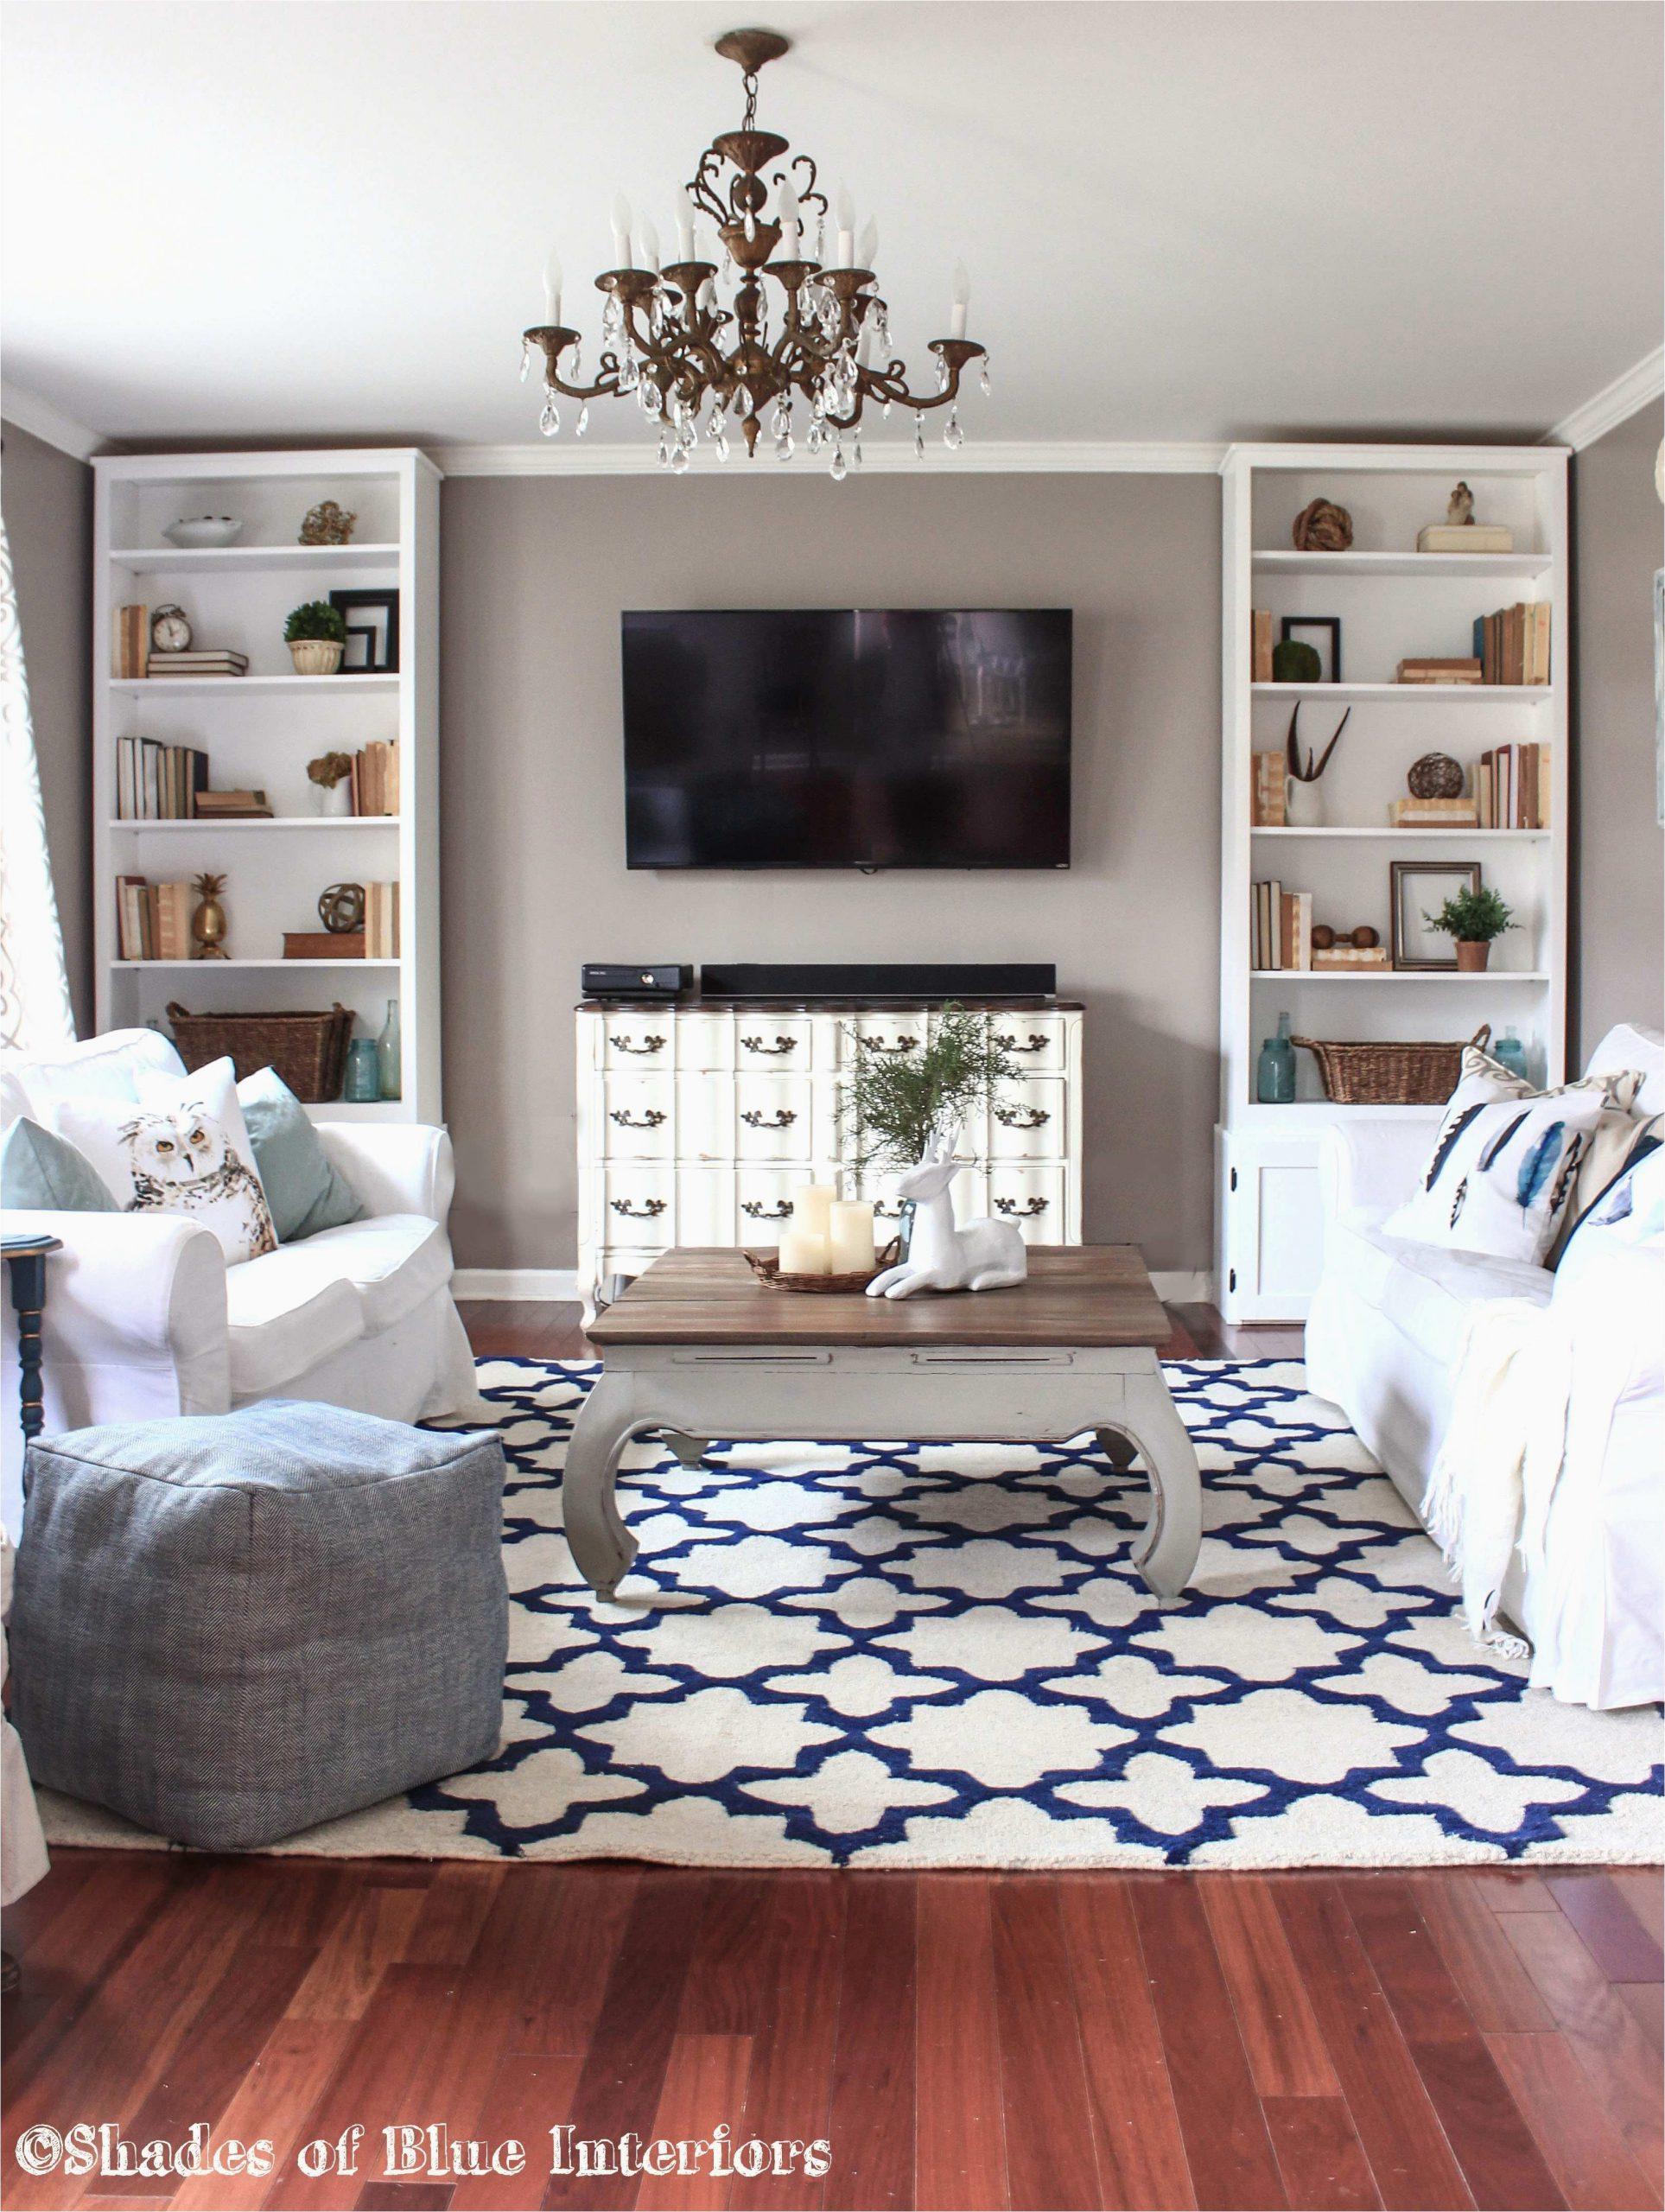 Fascinating Living Room Rug Idea small living room ideas on a bud best blog Fascinating Rug Room Idea Living